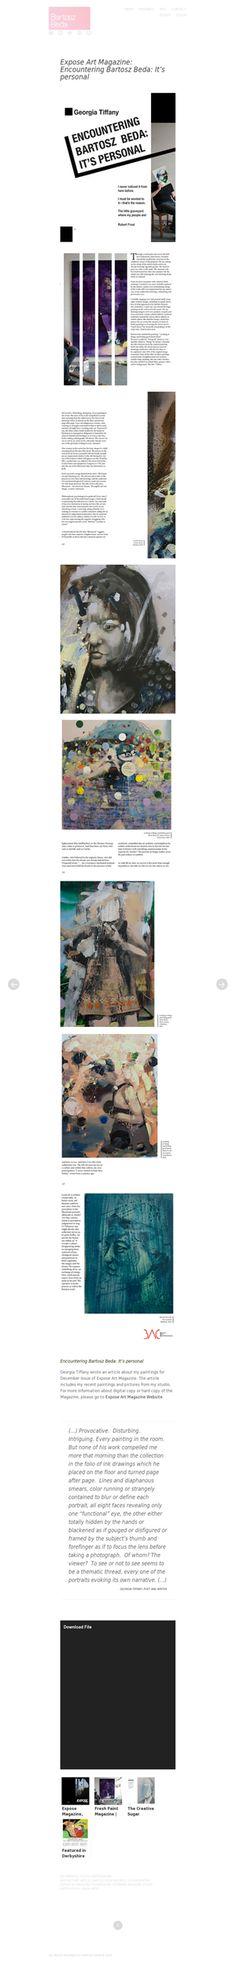 Article: http://bartoszbeda.com/expose-art-magazine-encountering-bartosz-beda-its-personal/